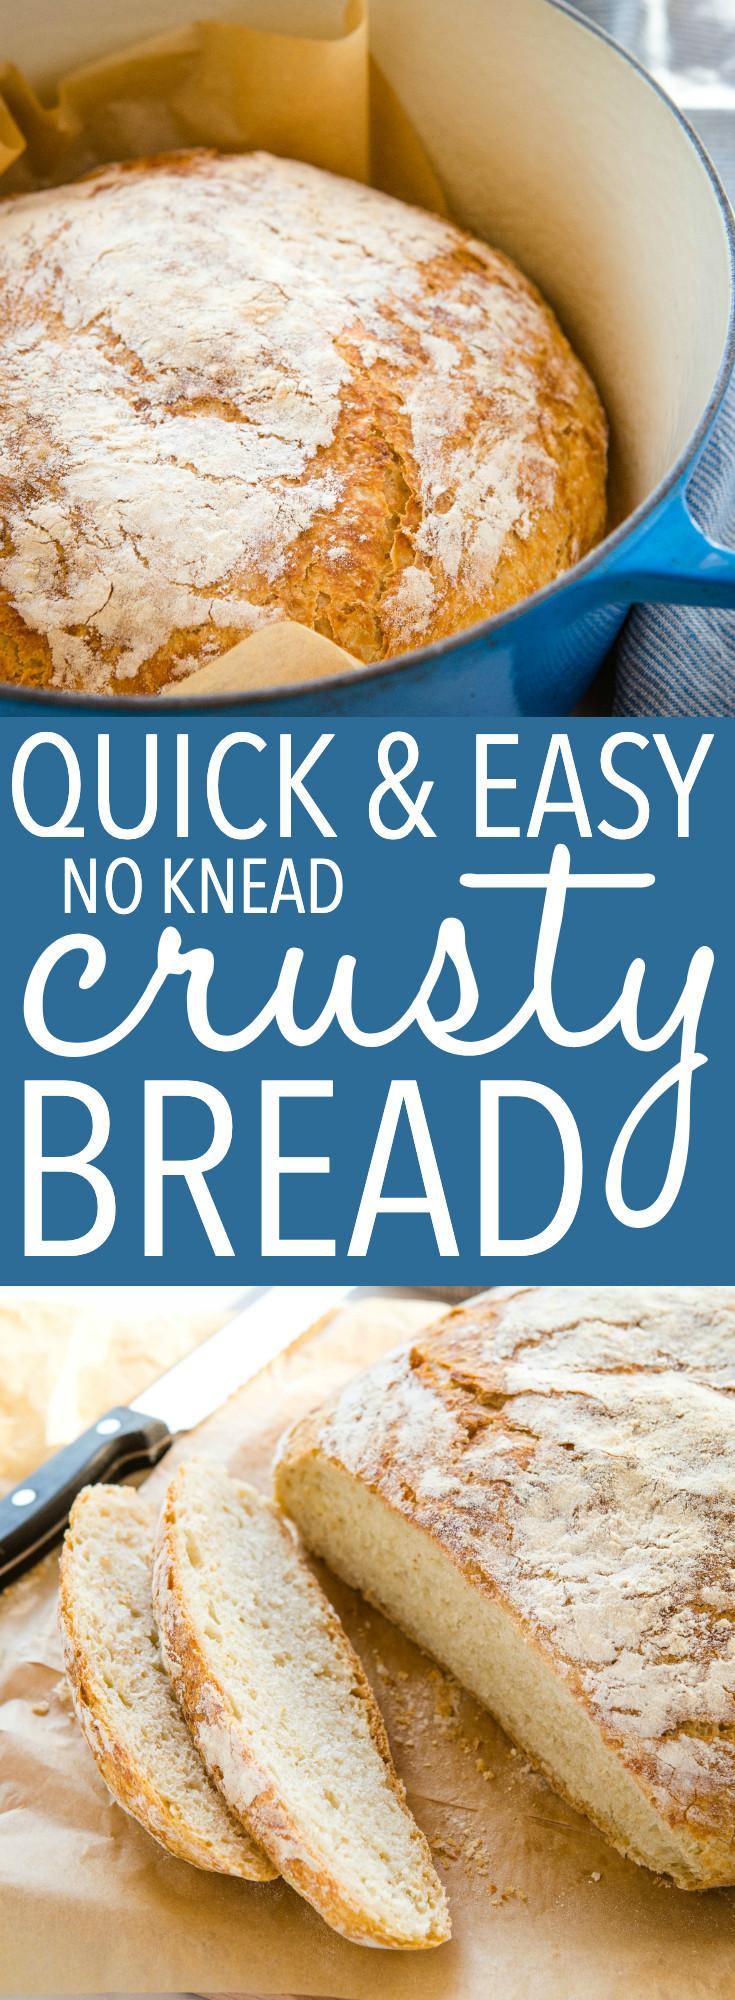 Easy No Knead Bread Recipe Quick  Quick & Easy No Knead Crusty Bread 4 Ingre nts The